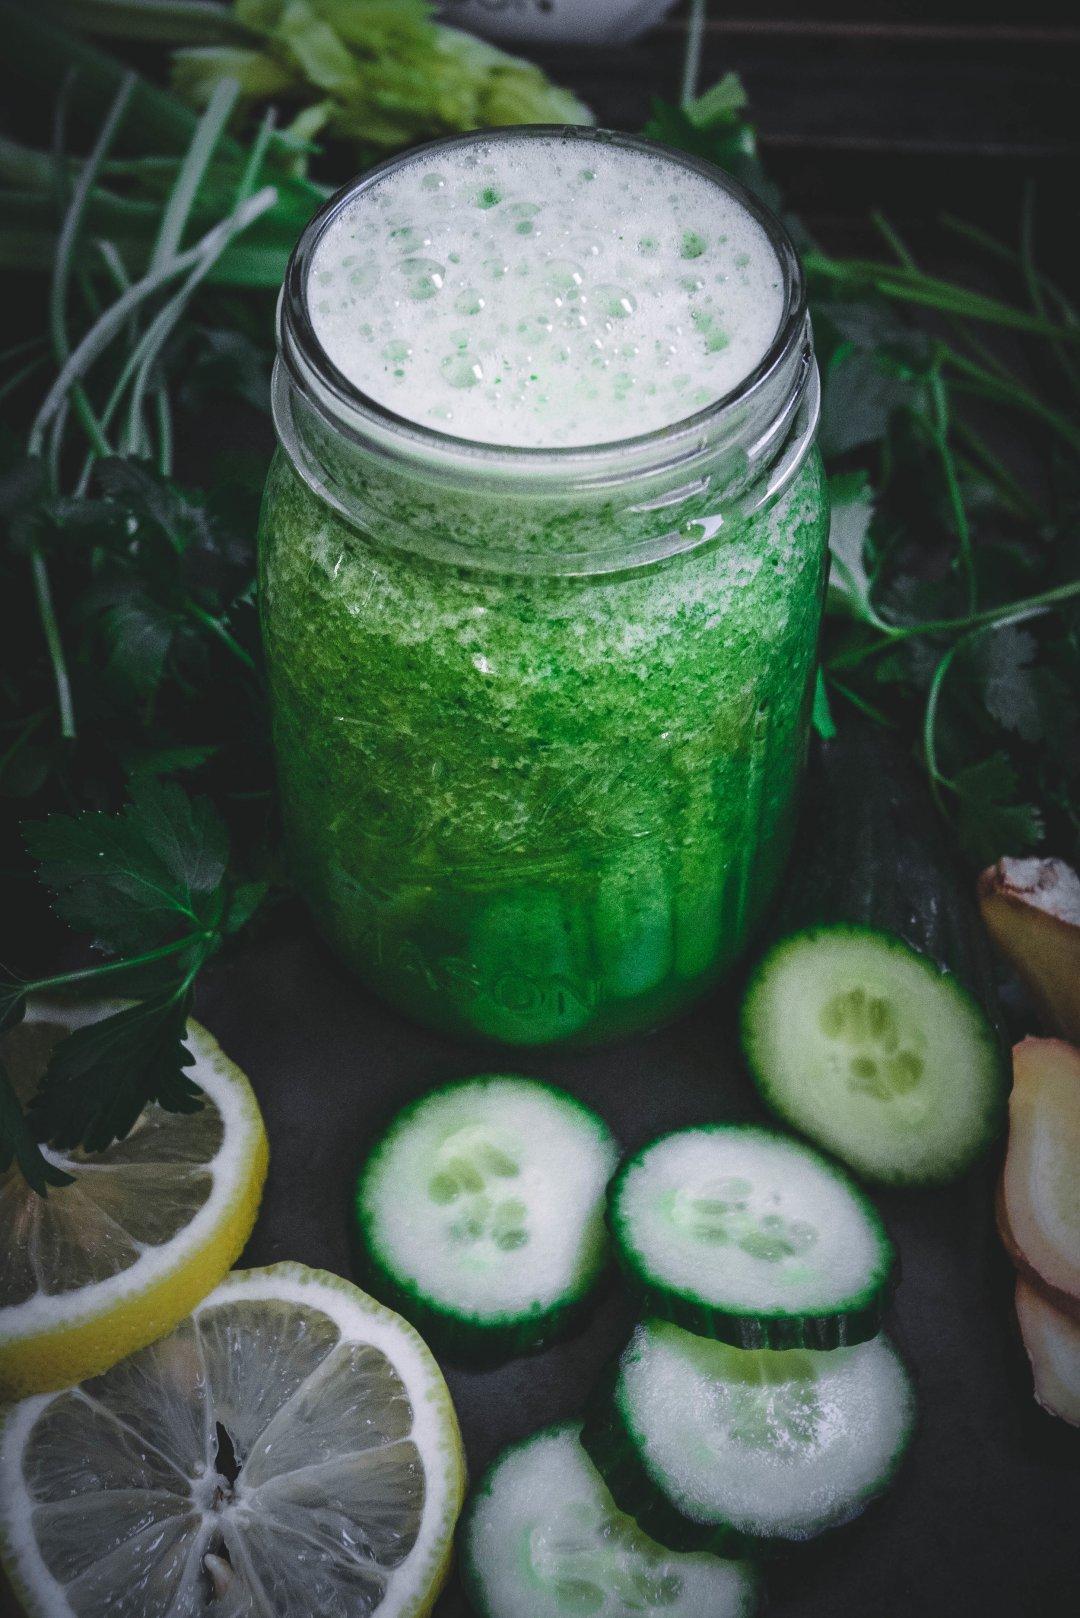 cilantro, cucumber, parsley, ginger, lemon and celery smoothie